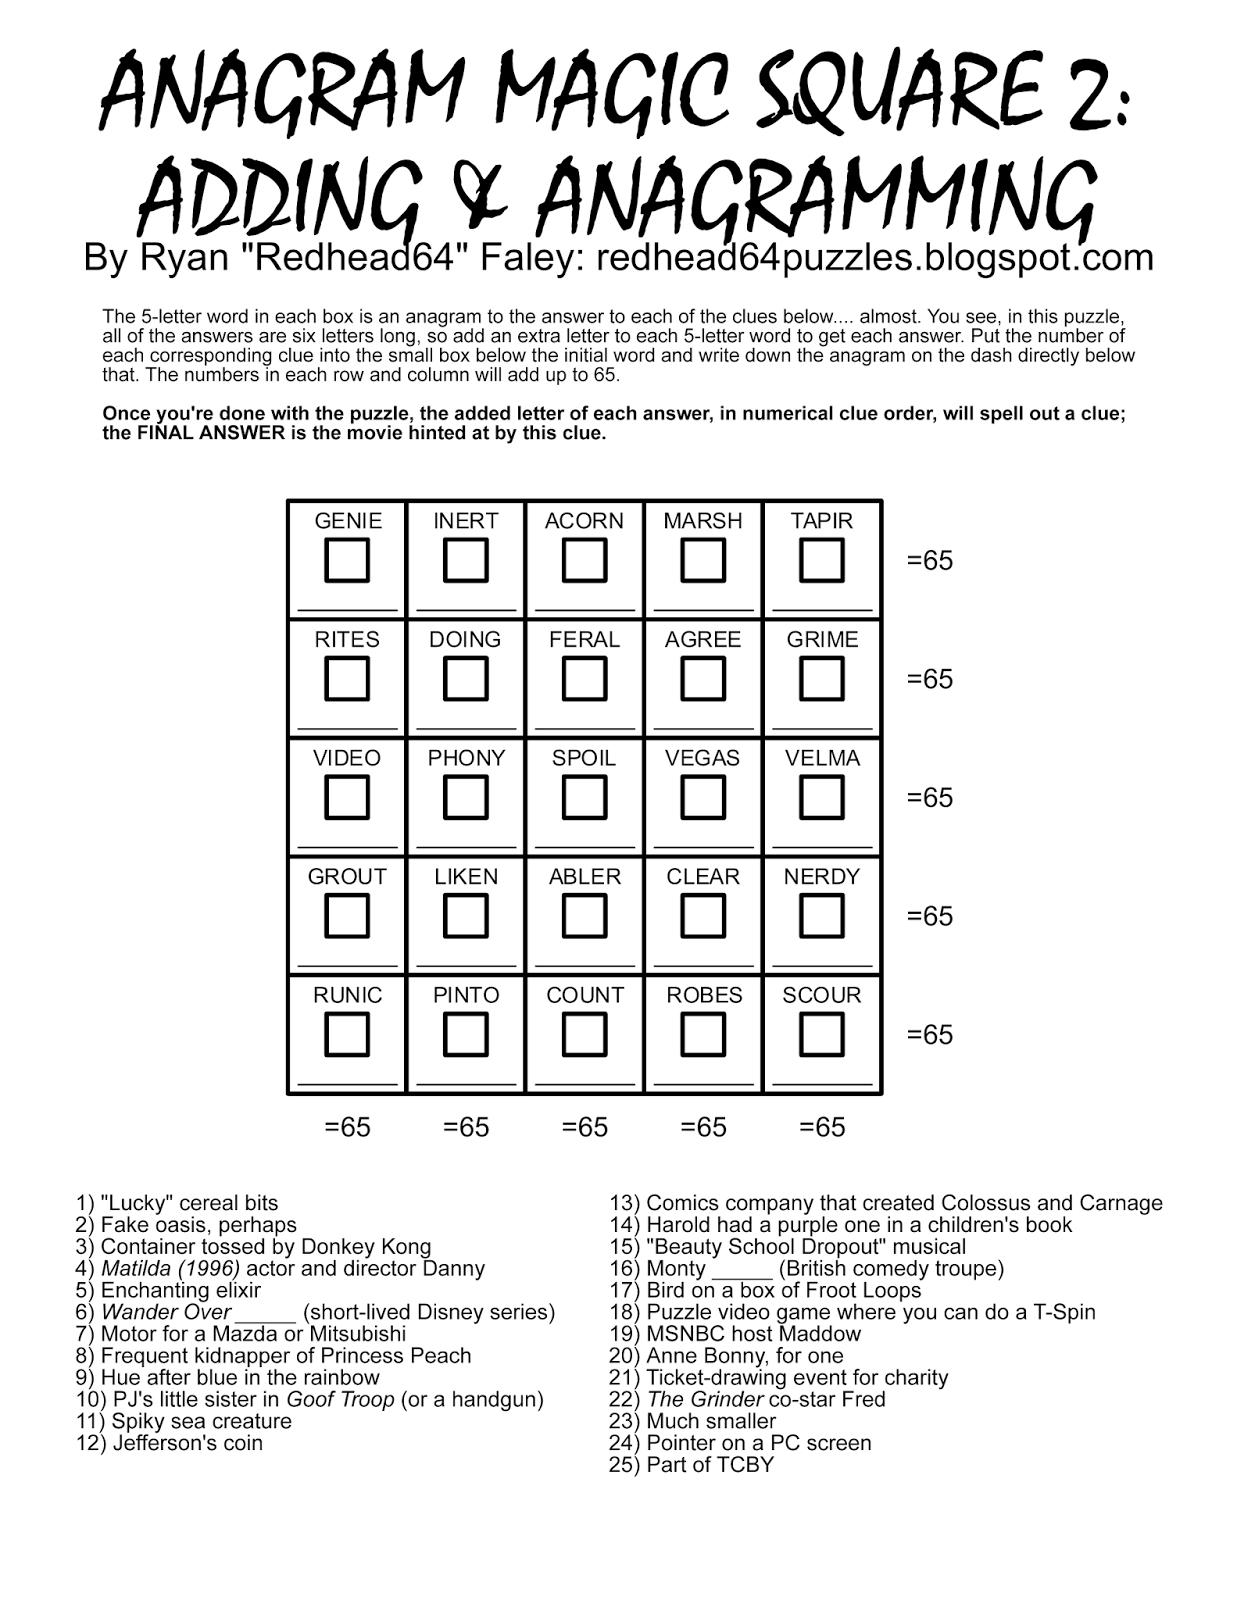 Redhead64's Obscure Puzzle Blog!: Puzzle #93: Anagram Magic Square 2 - Printable Anagram Puzzles